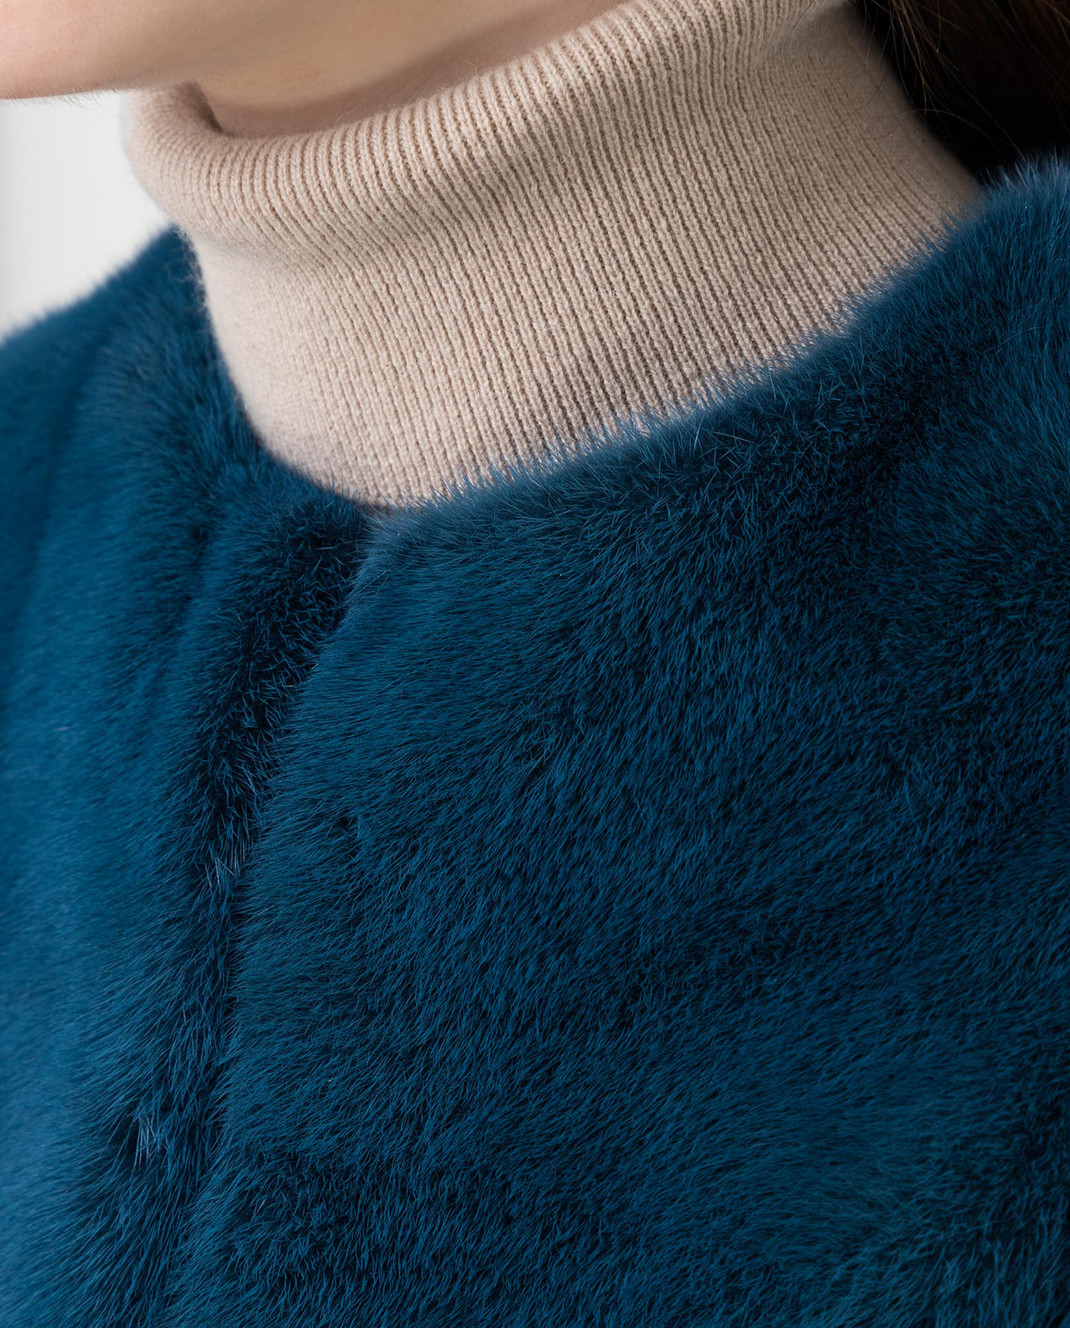 Fabio Gavazzi Синяя шуба из меха норки 9VI000F18FG92PIVR изображение 5